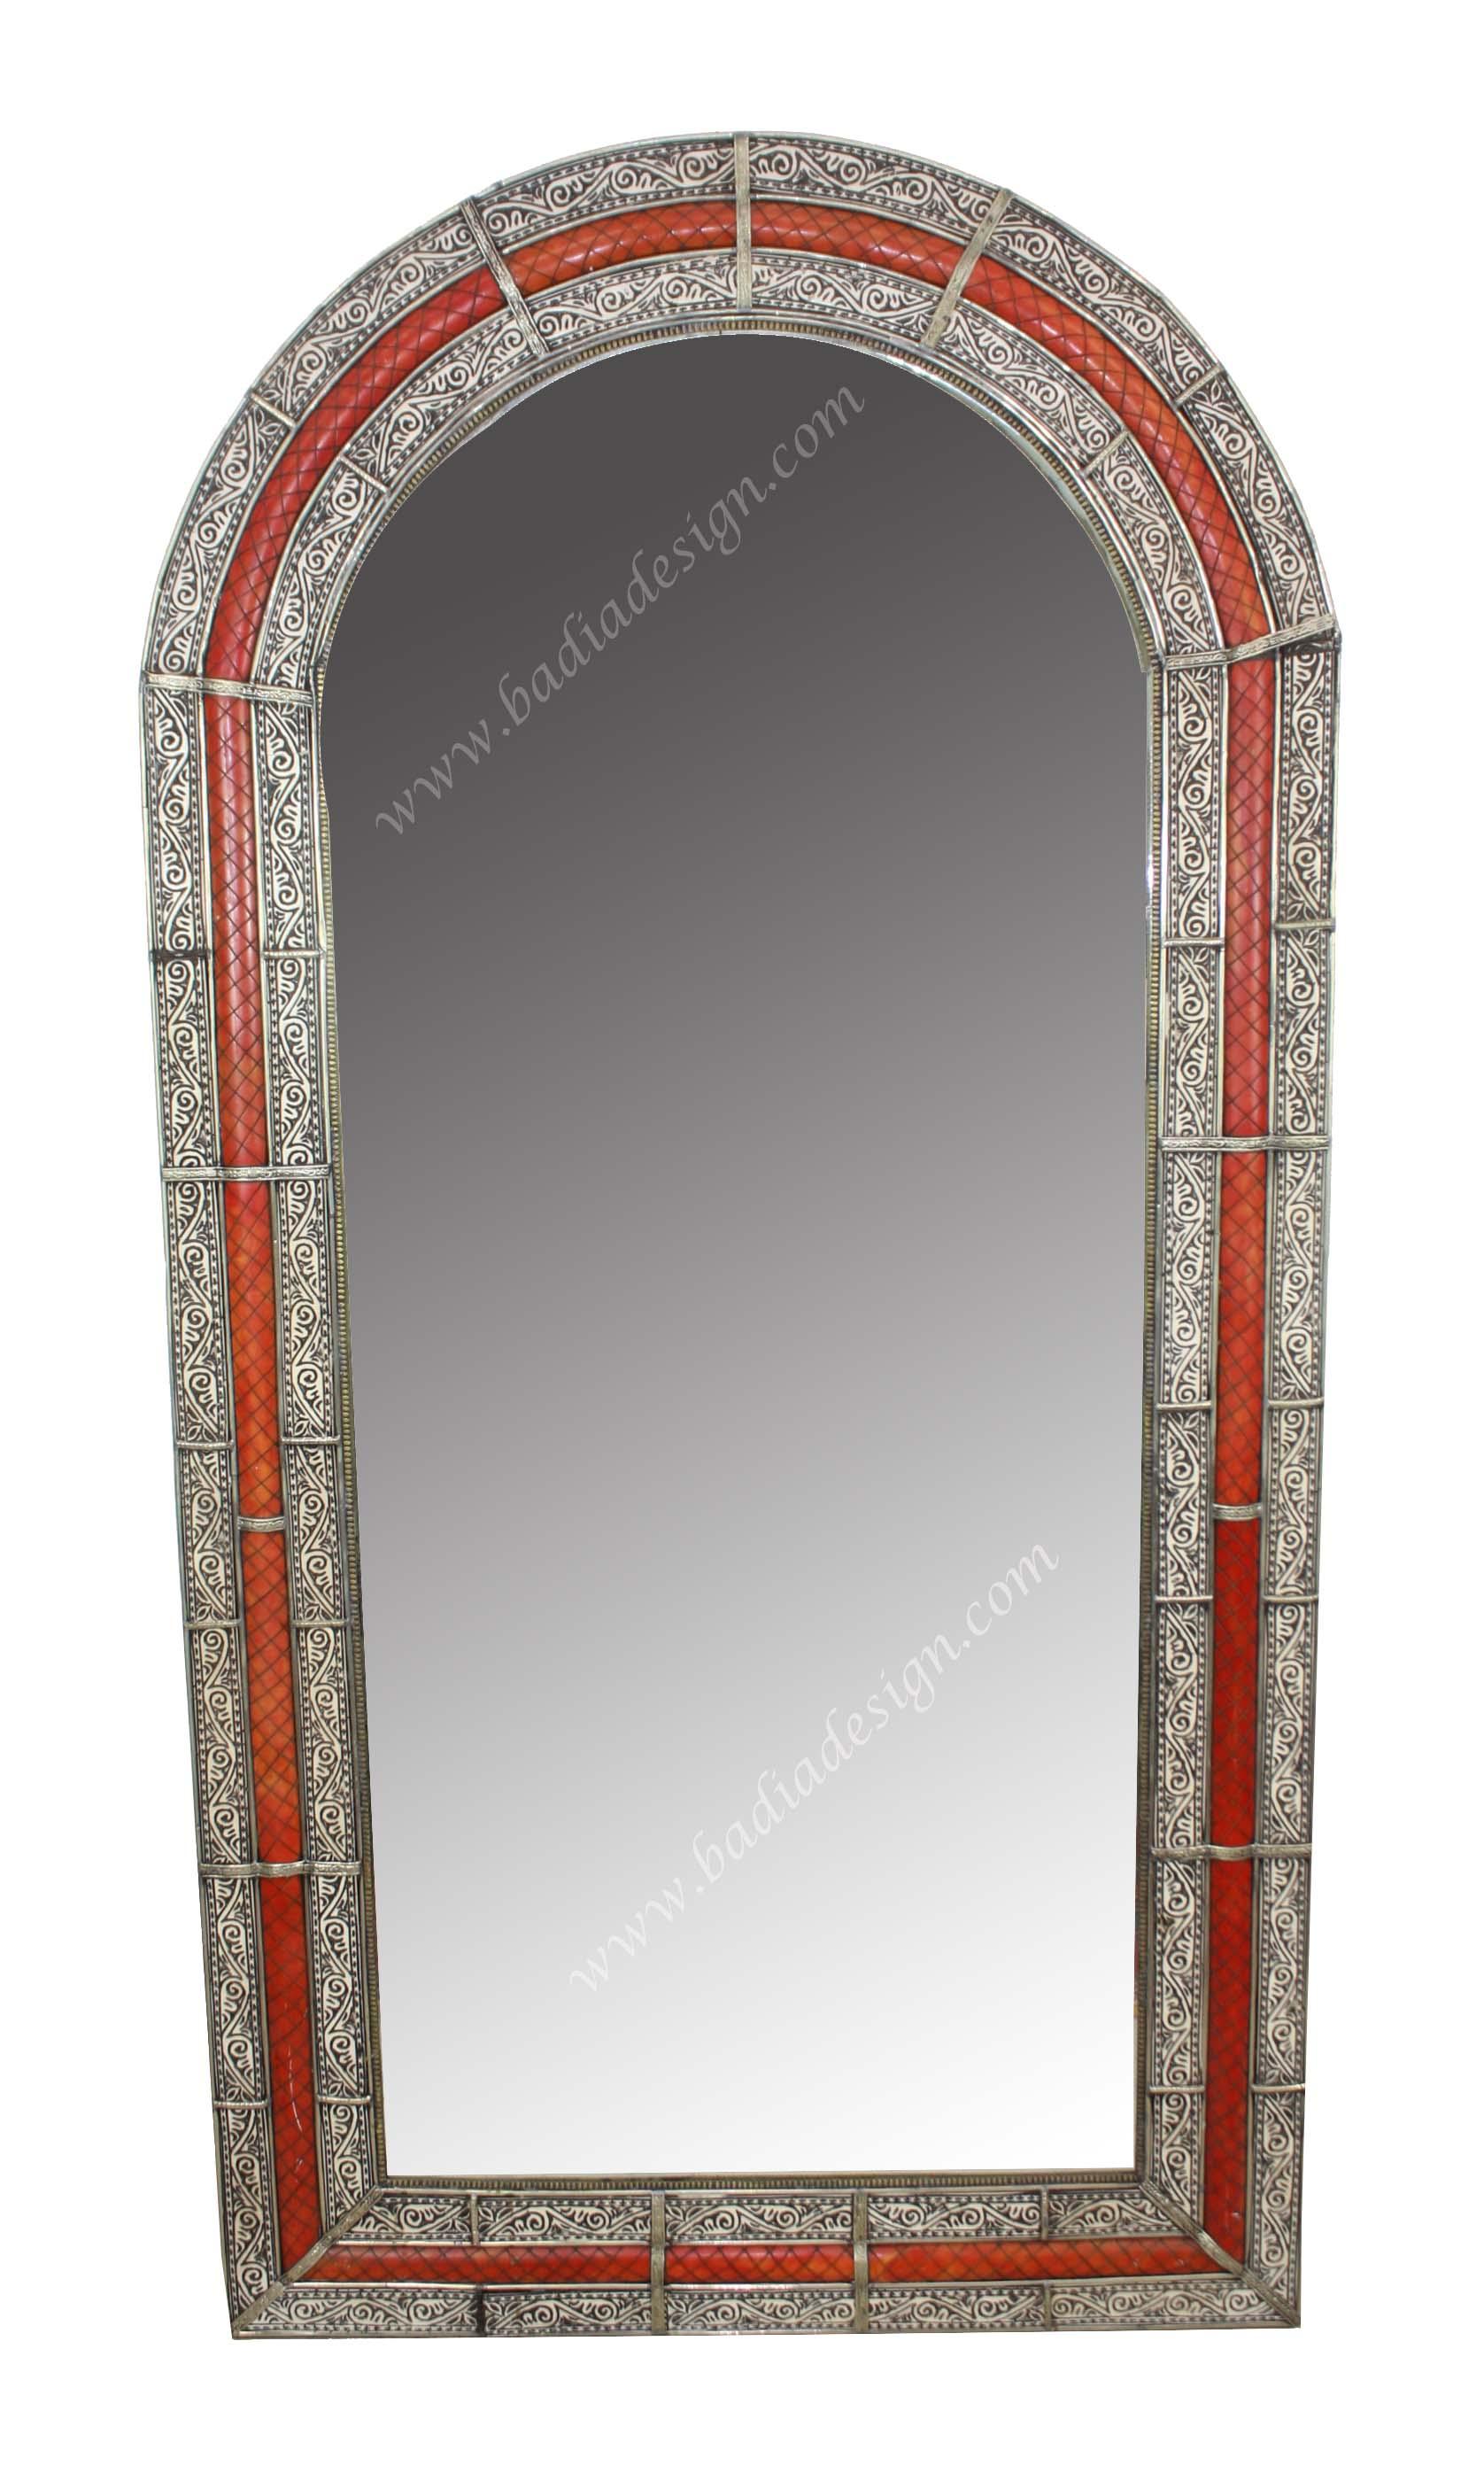 moroccan-camel-bone-mirror-m-mr004.jpg